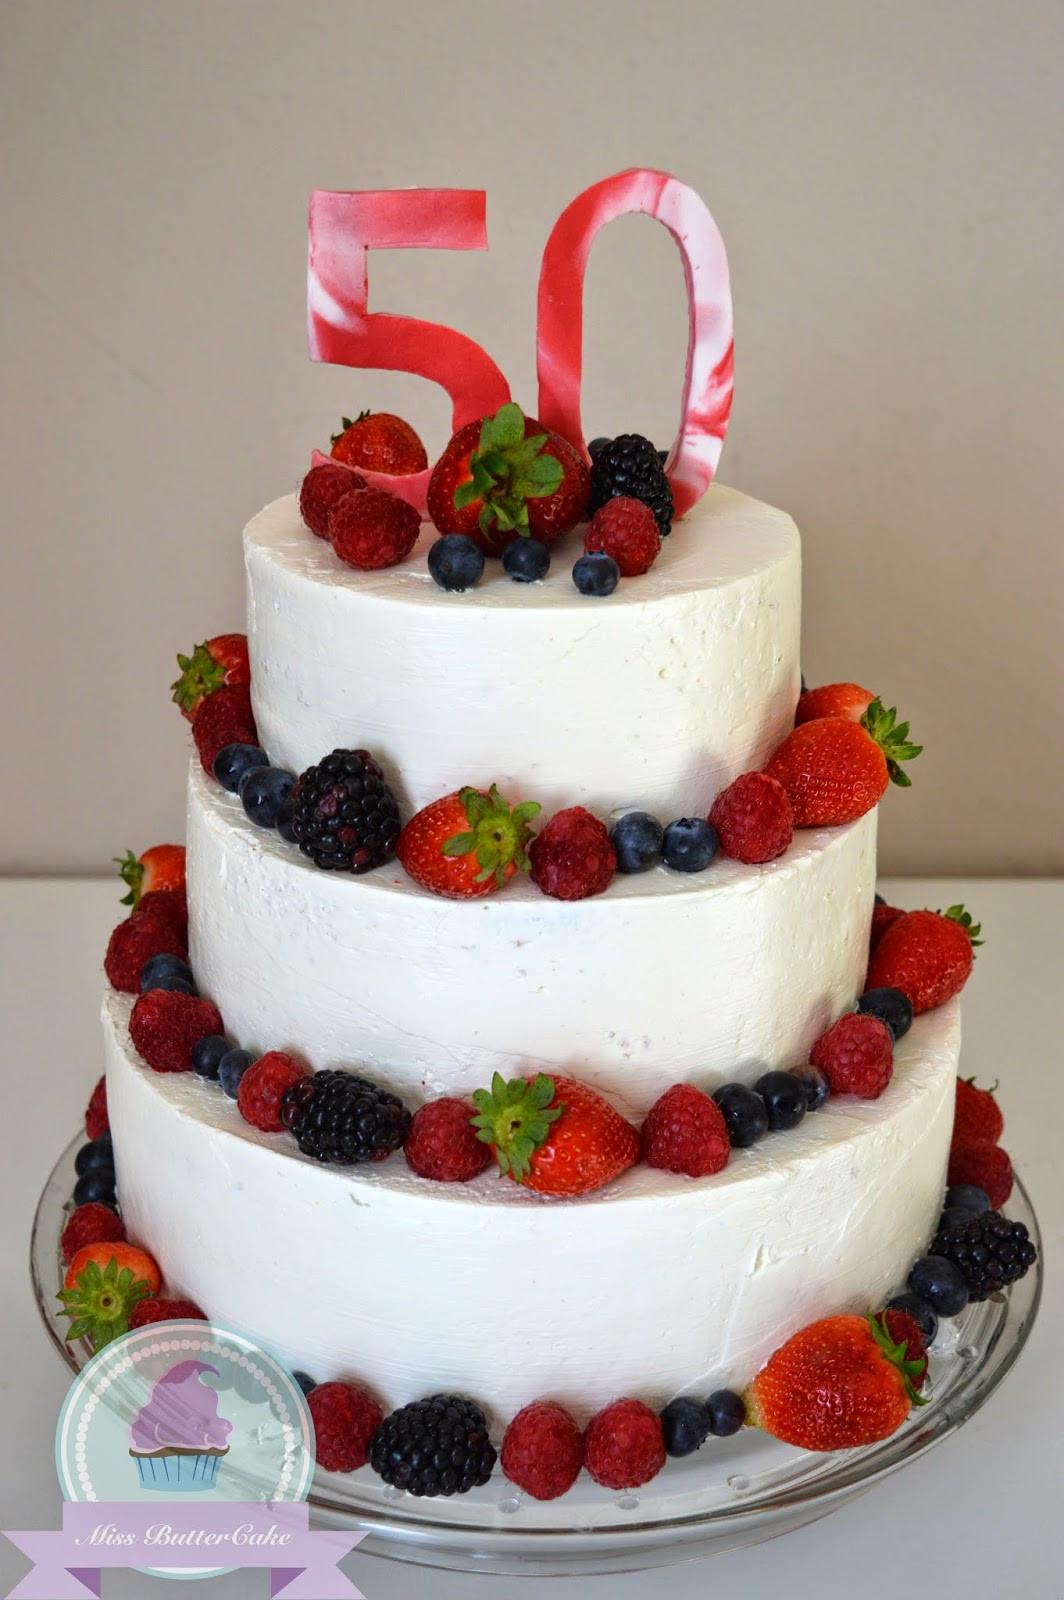 Geburtstagstorte 50 Geburtstag  Miss ButterCake 3 Stöckige Torte mit Beeren Deko